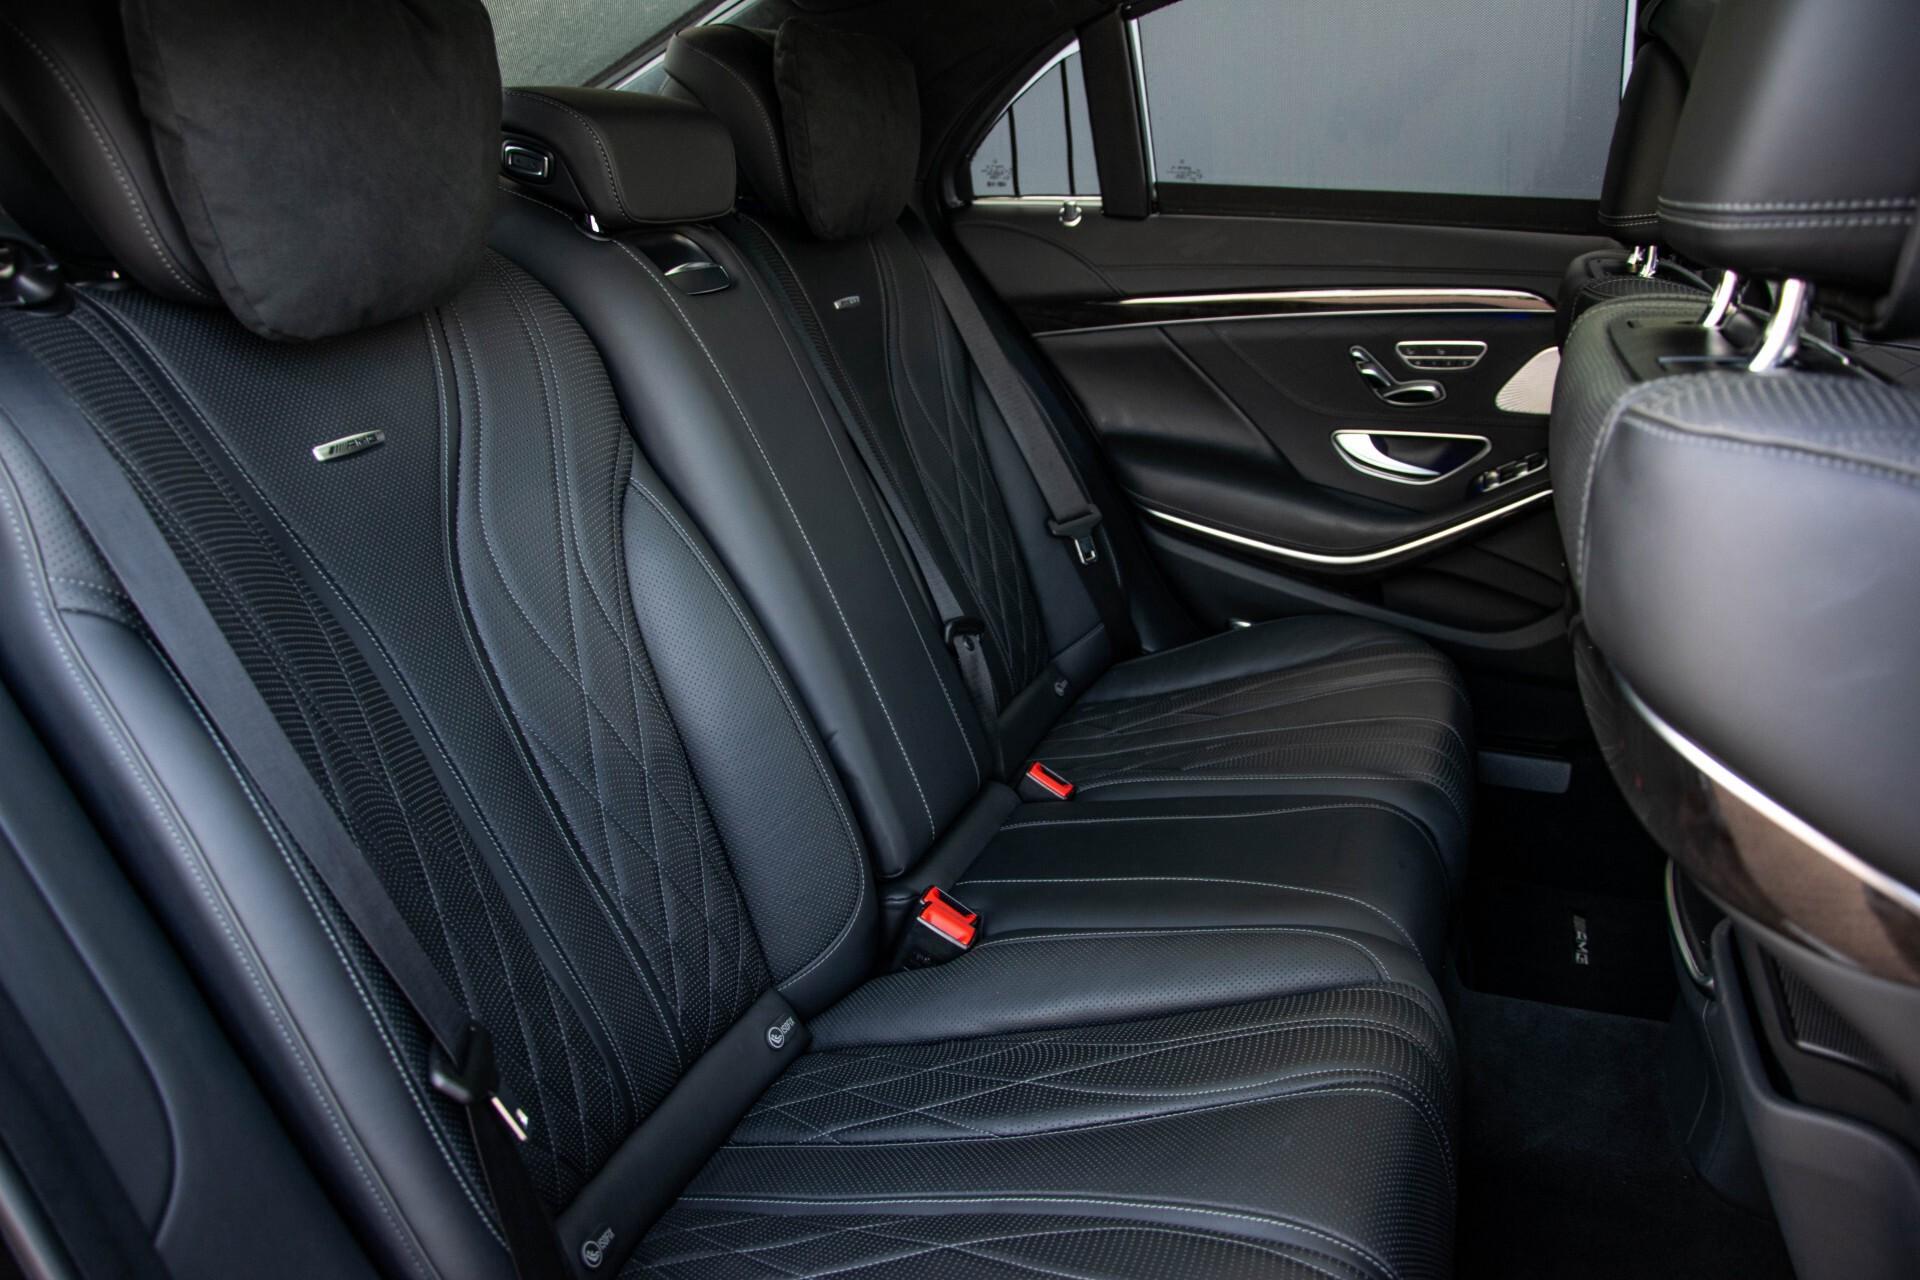 Mercedes-Benz S-Klasse 63 AMG Exclusive/Burmester High-End/Driverspack Aut7 Foto 4